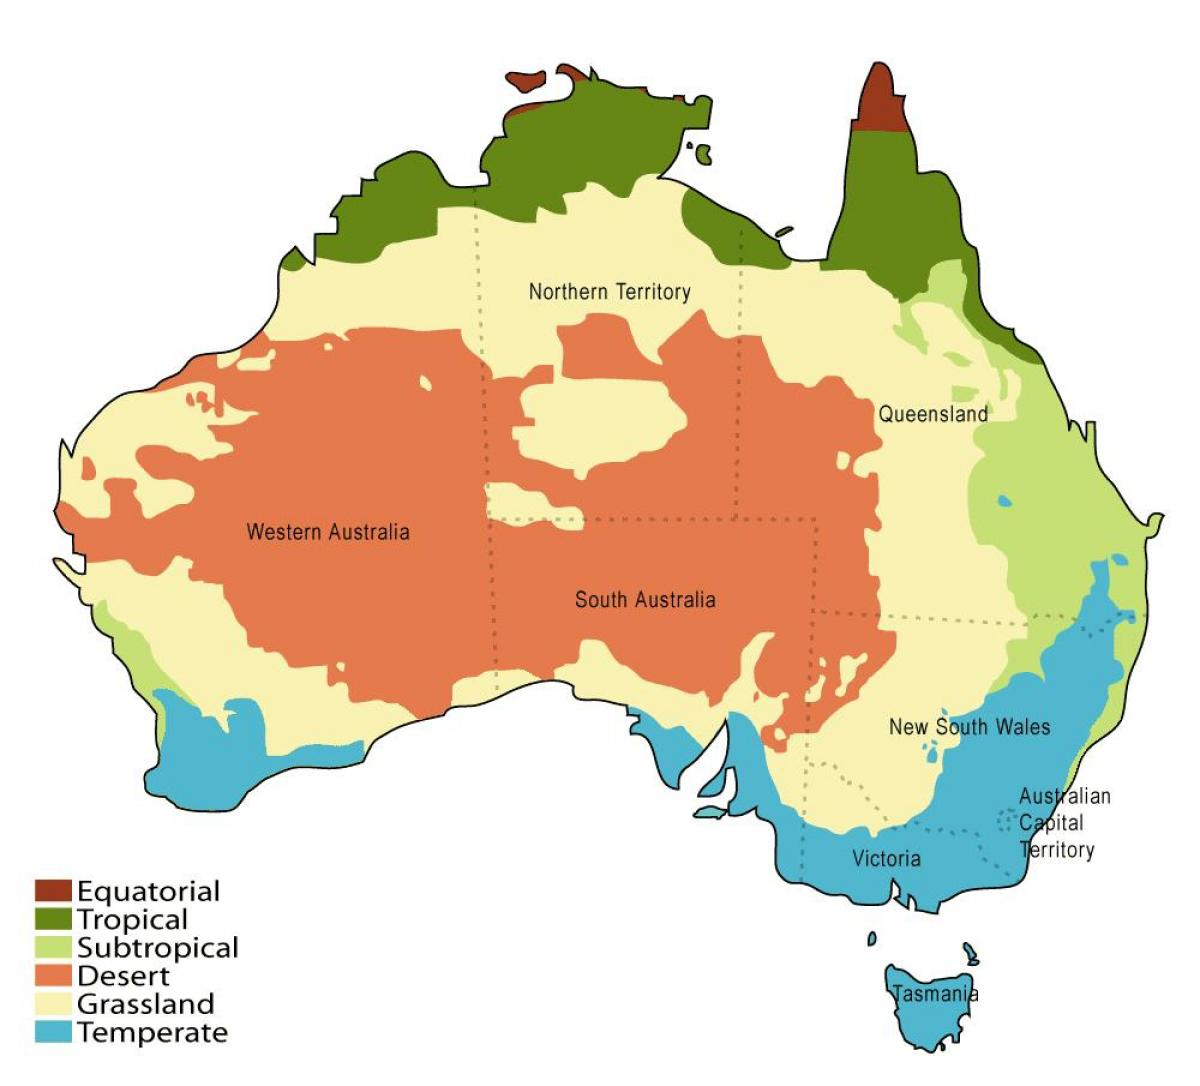 clima mapa da austrlia